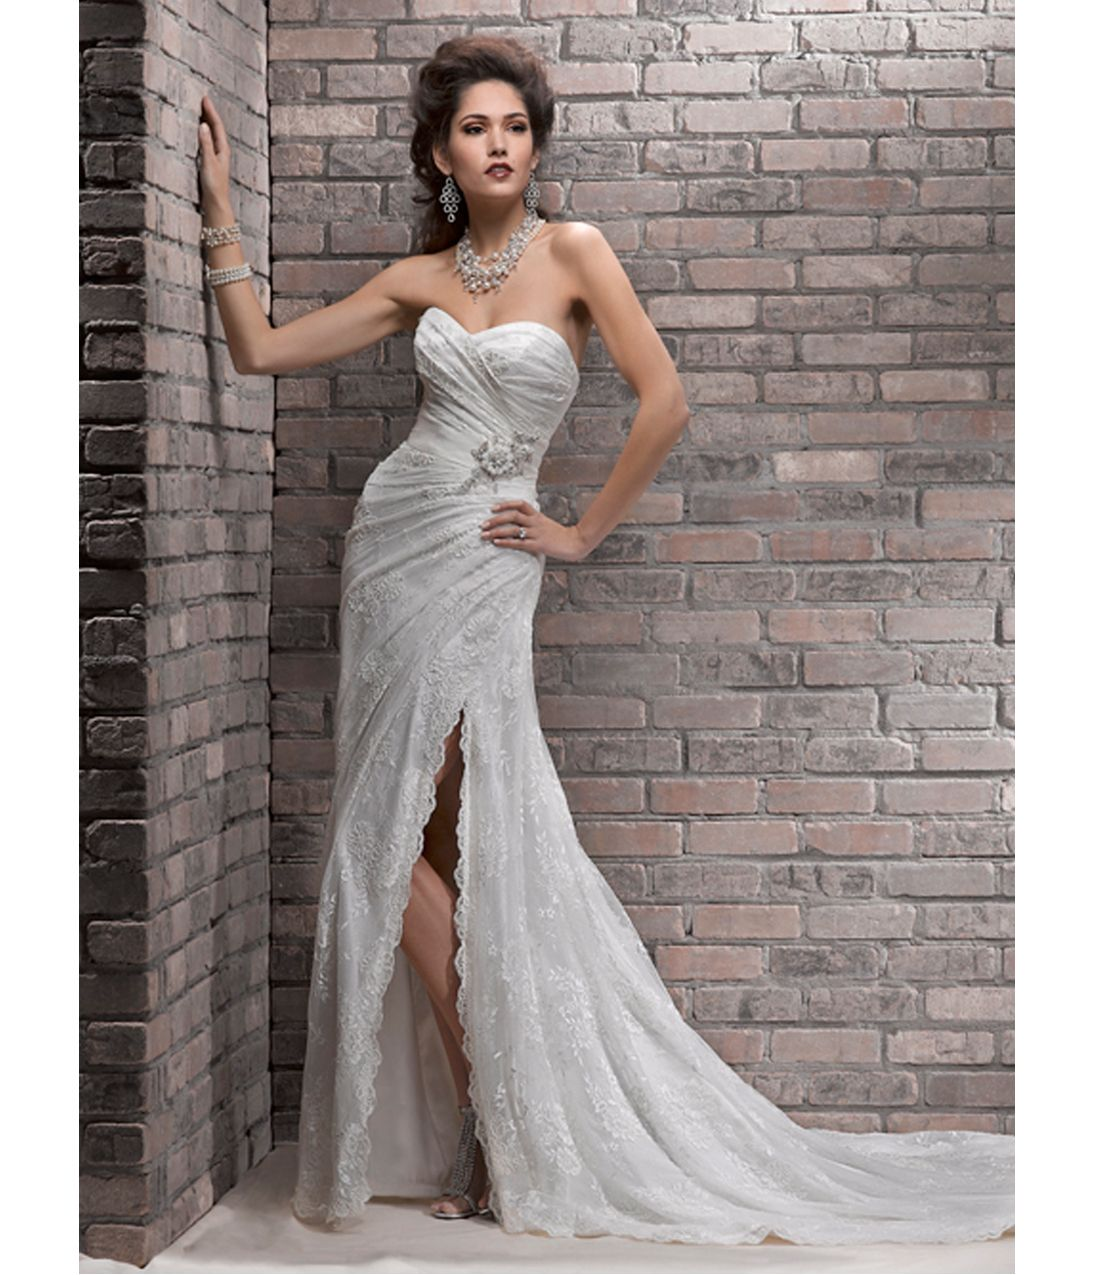 1950s style wedding dresses  Vintage s Style Black High Halter Neck u Bow One Piece Swimsuit